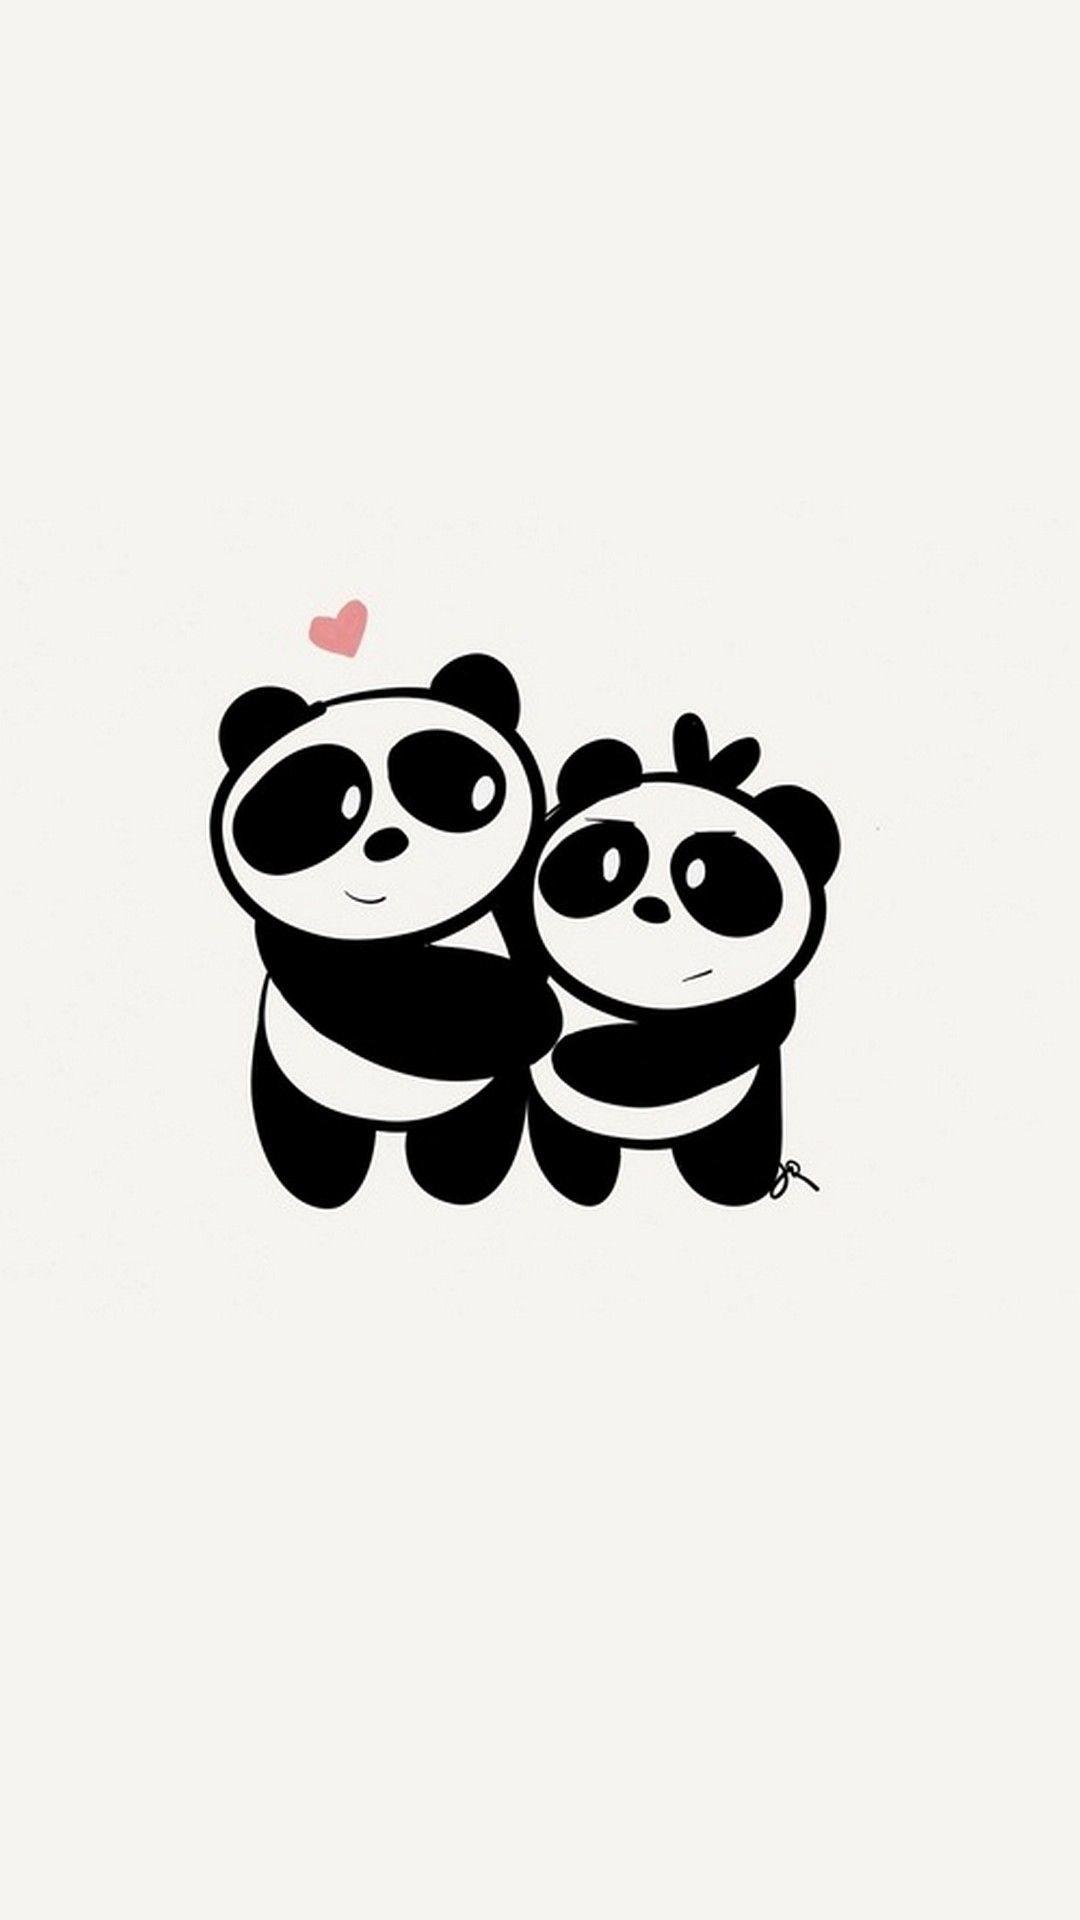 Res: 1080x1920, iPhone X Cute Couple Panda Wallpaper - Best iPhone Wallpaper